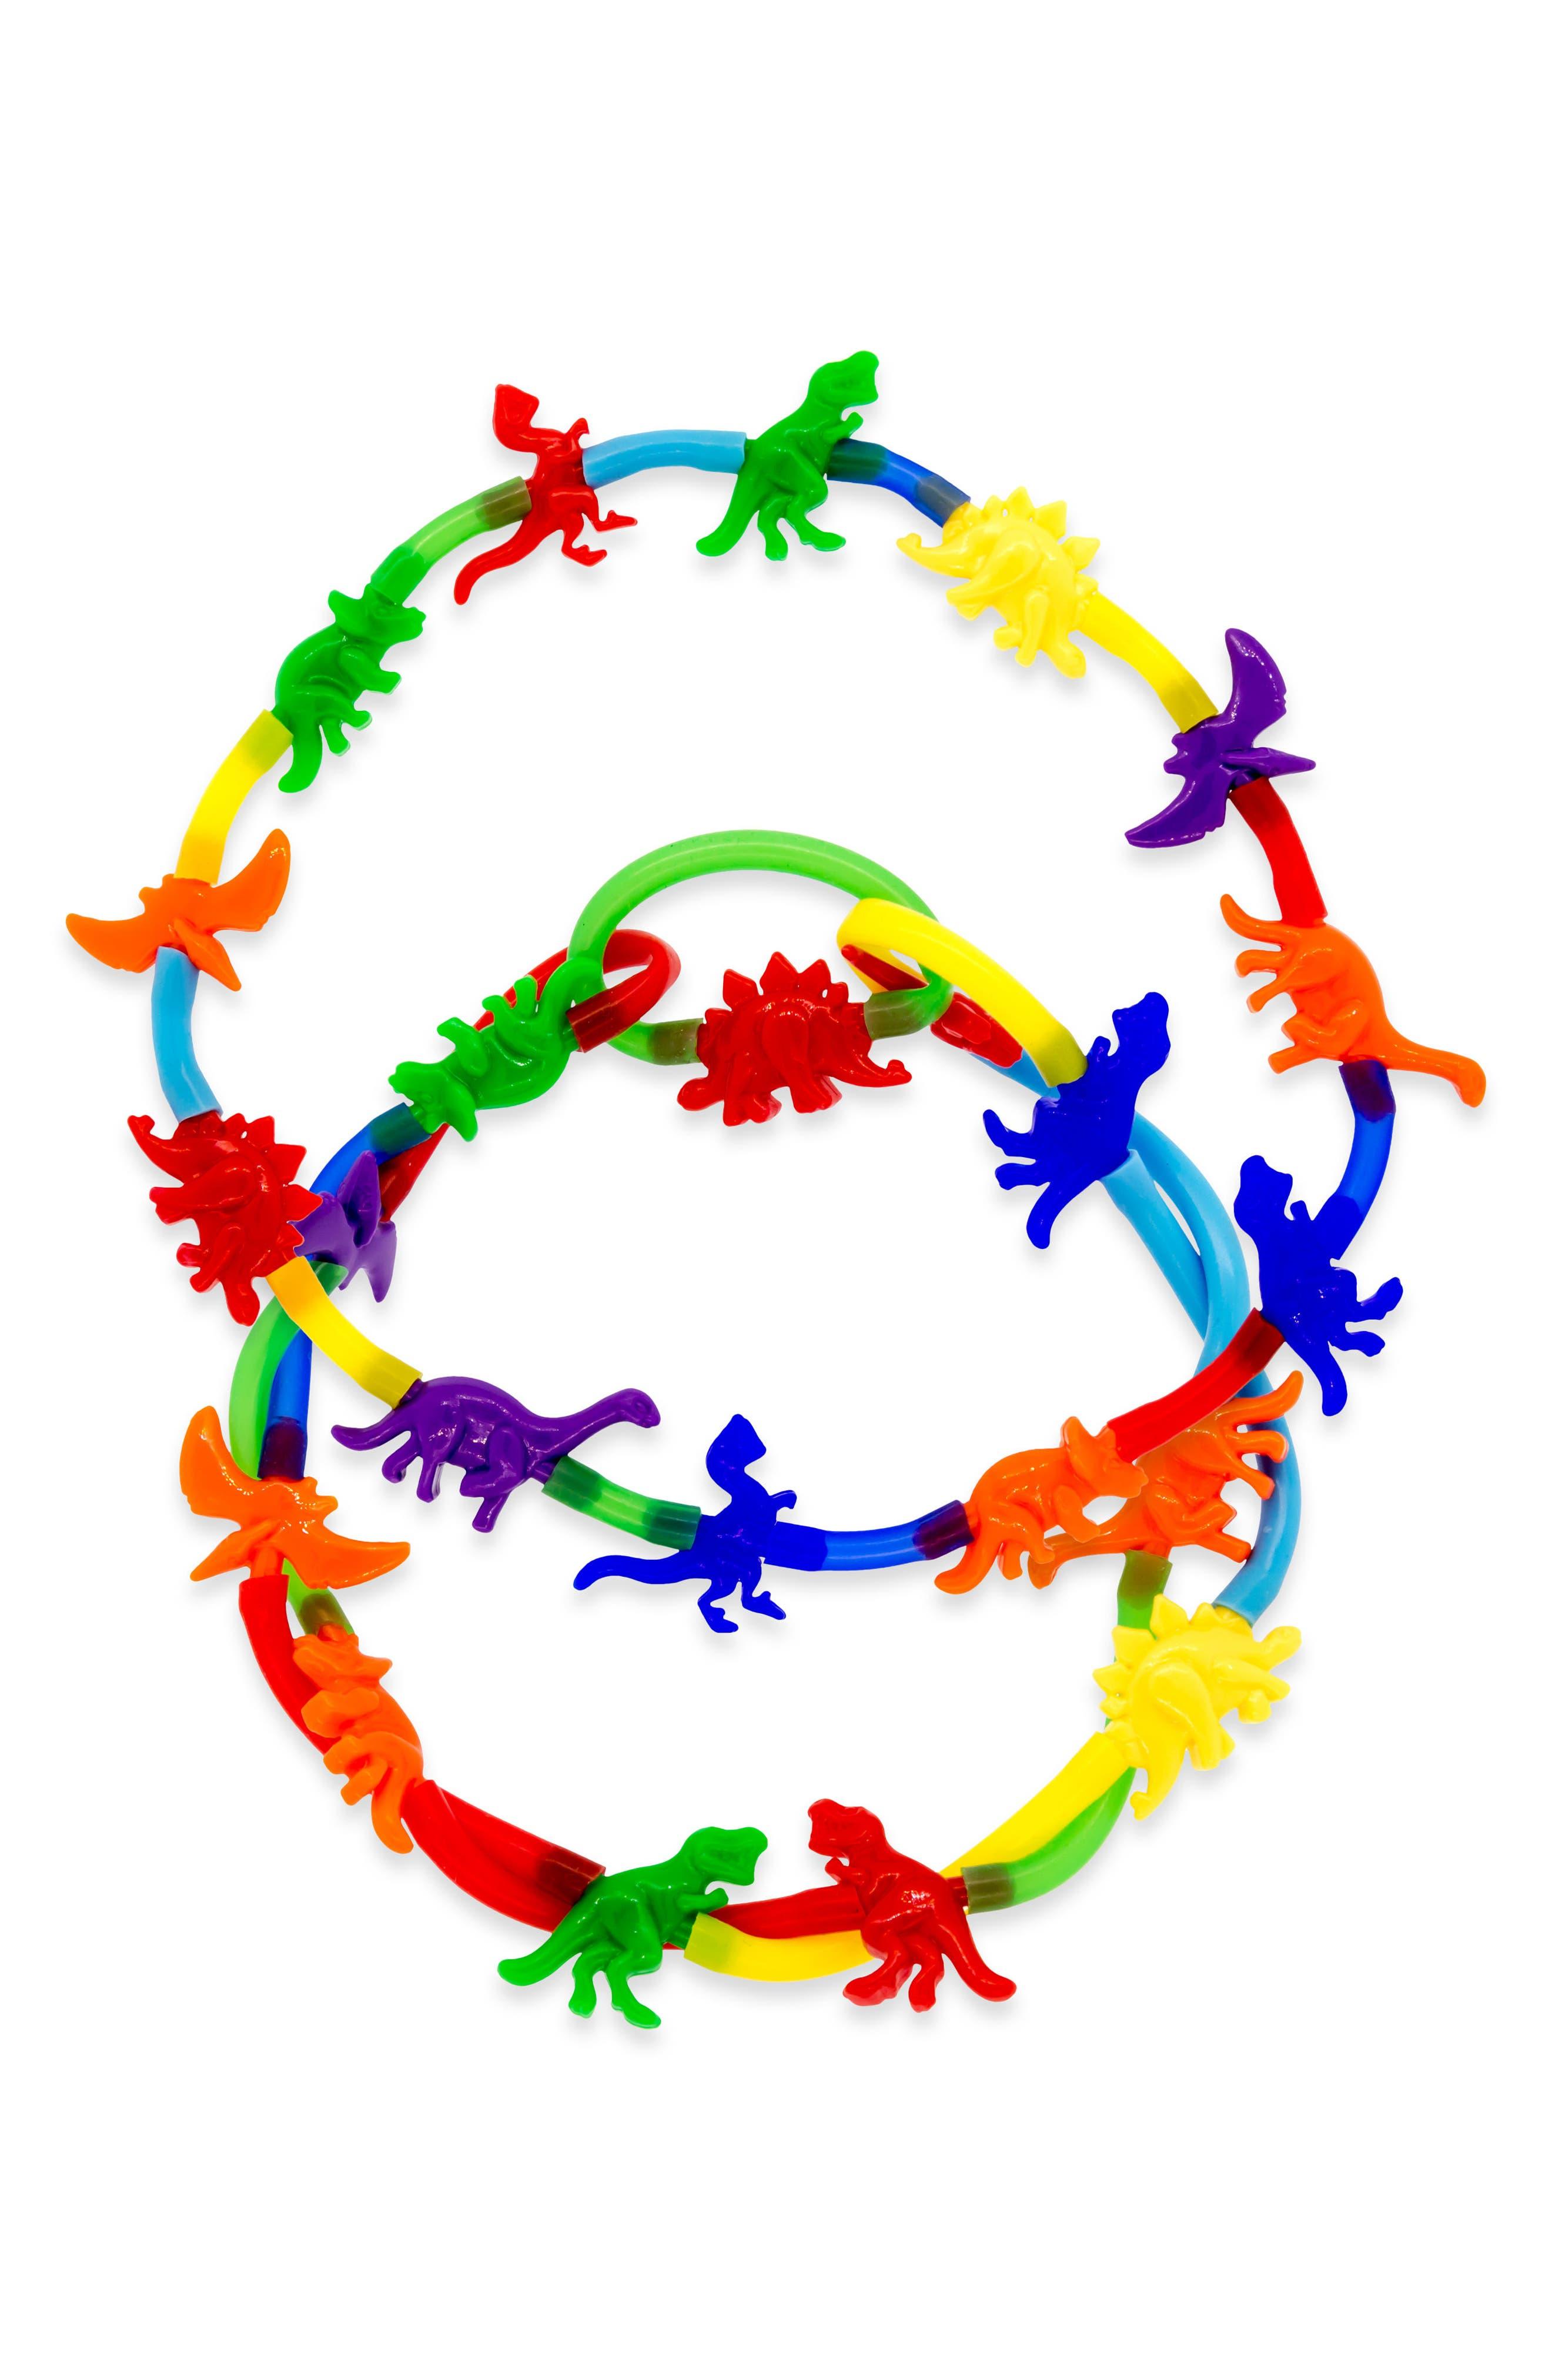 35-Piece Dinosaur Series Linking Toy Kit,                             Alternate thumbnail 2, color,